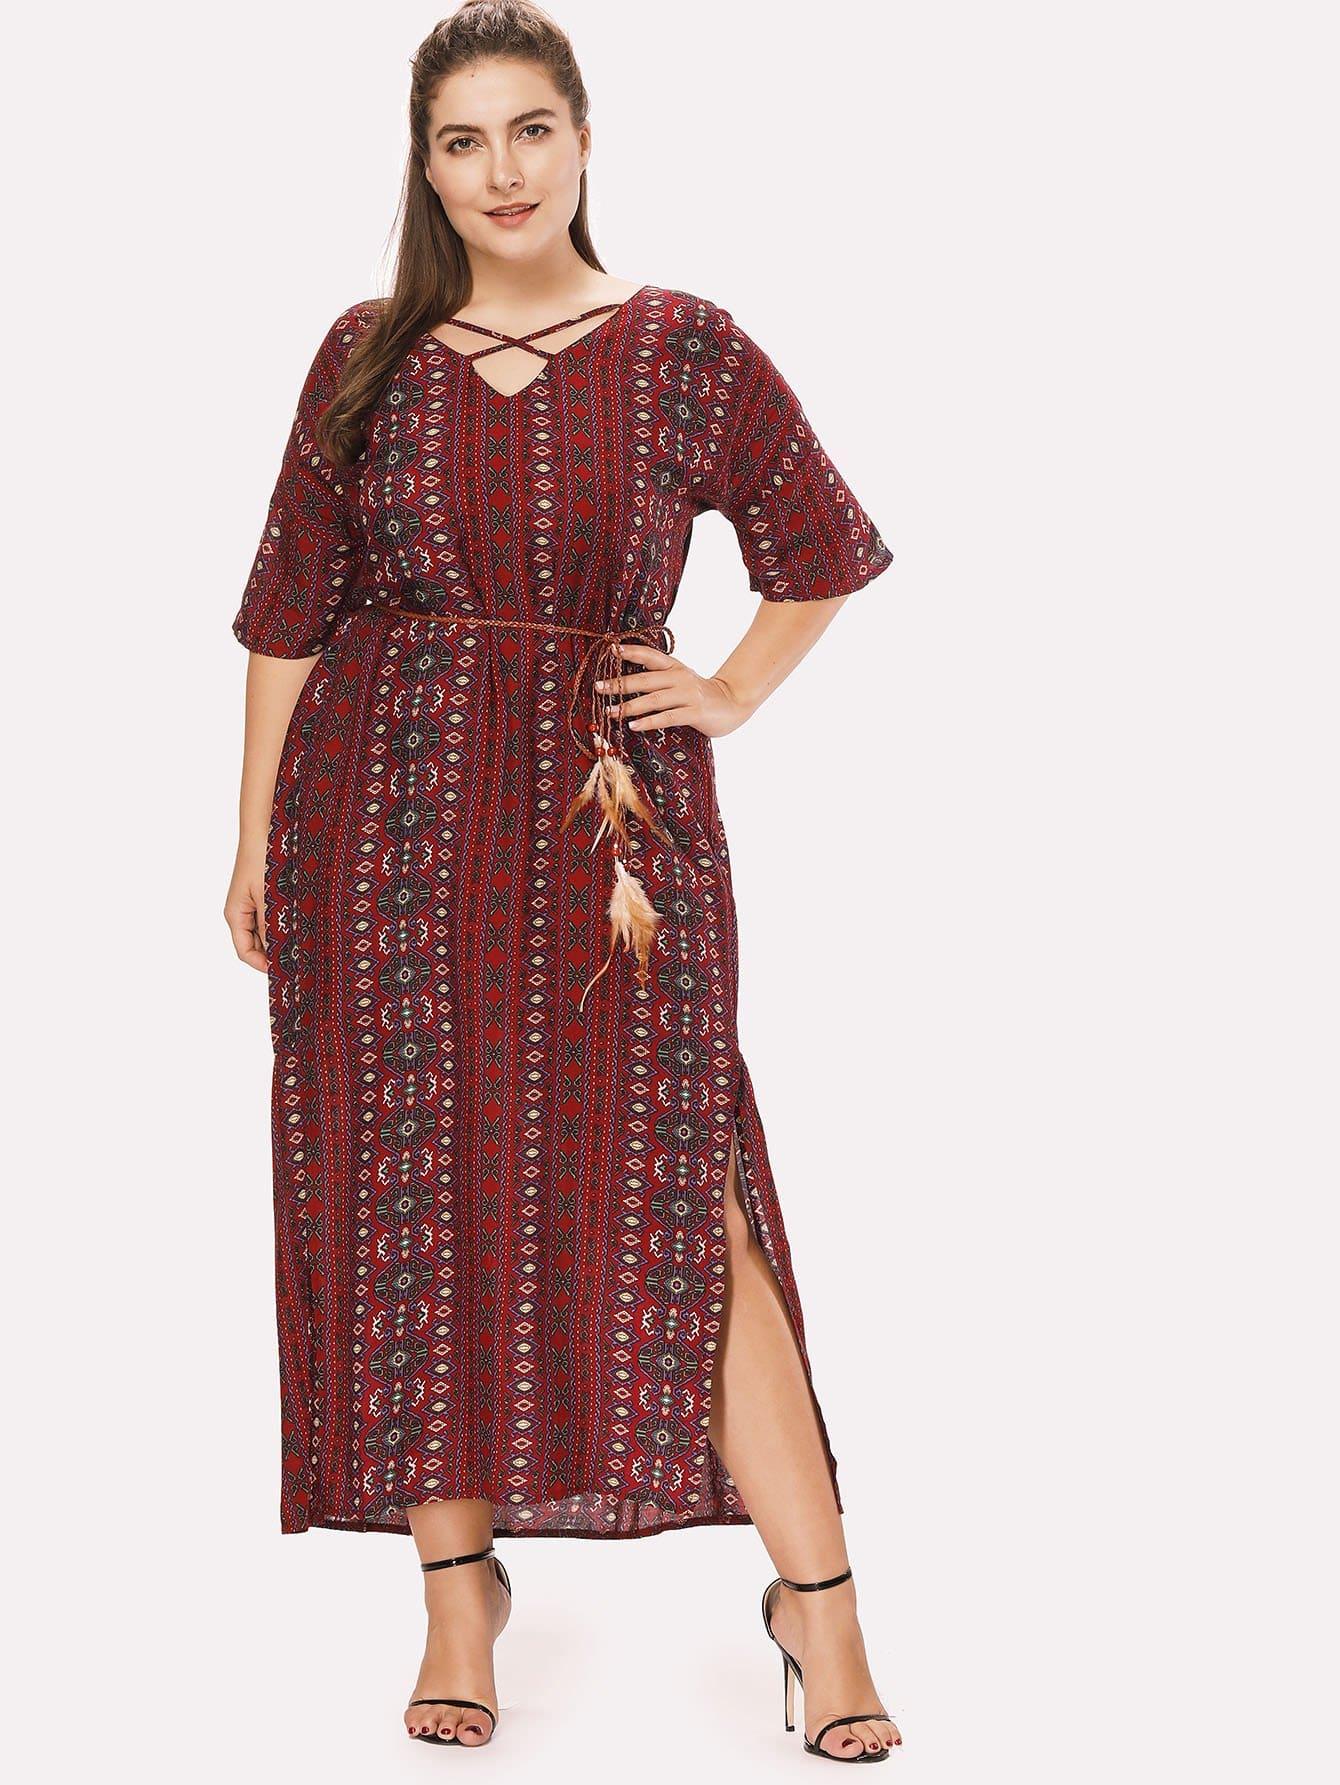 Ornate Print Knot Side Slit Dress guitar print knot side dress